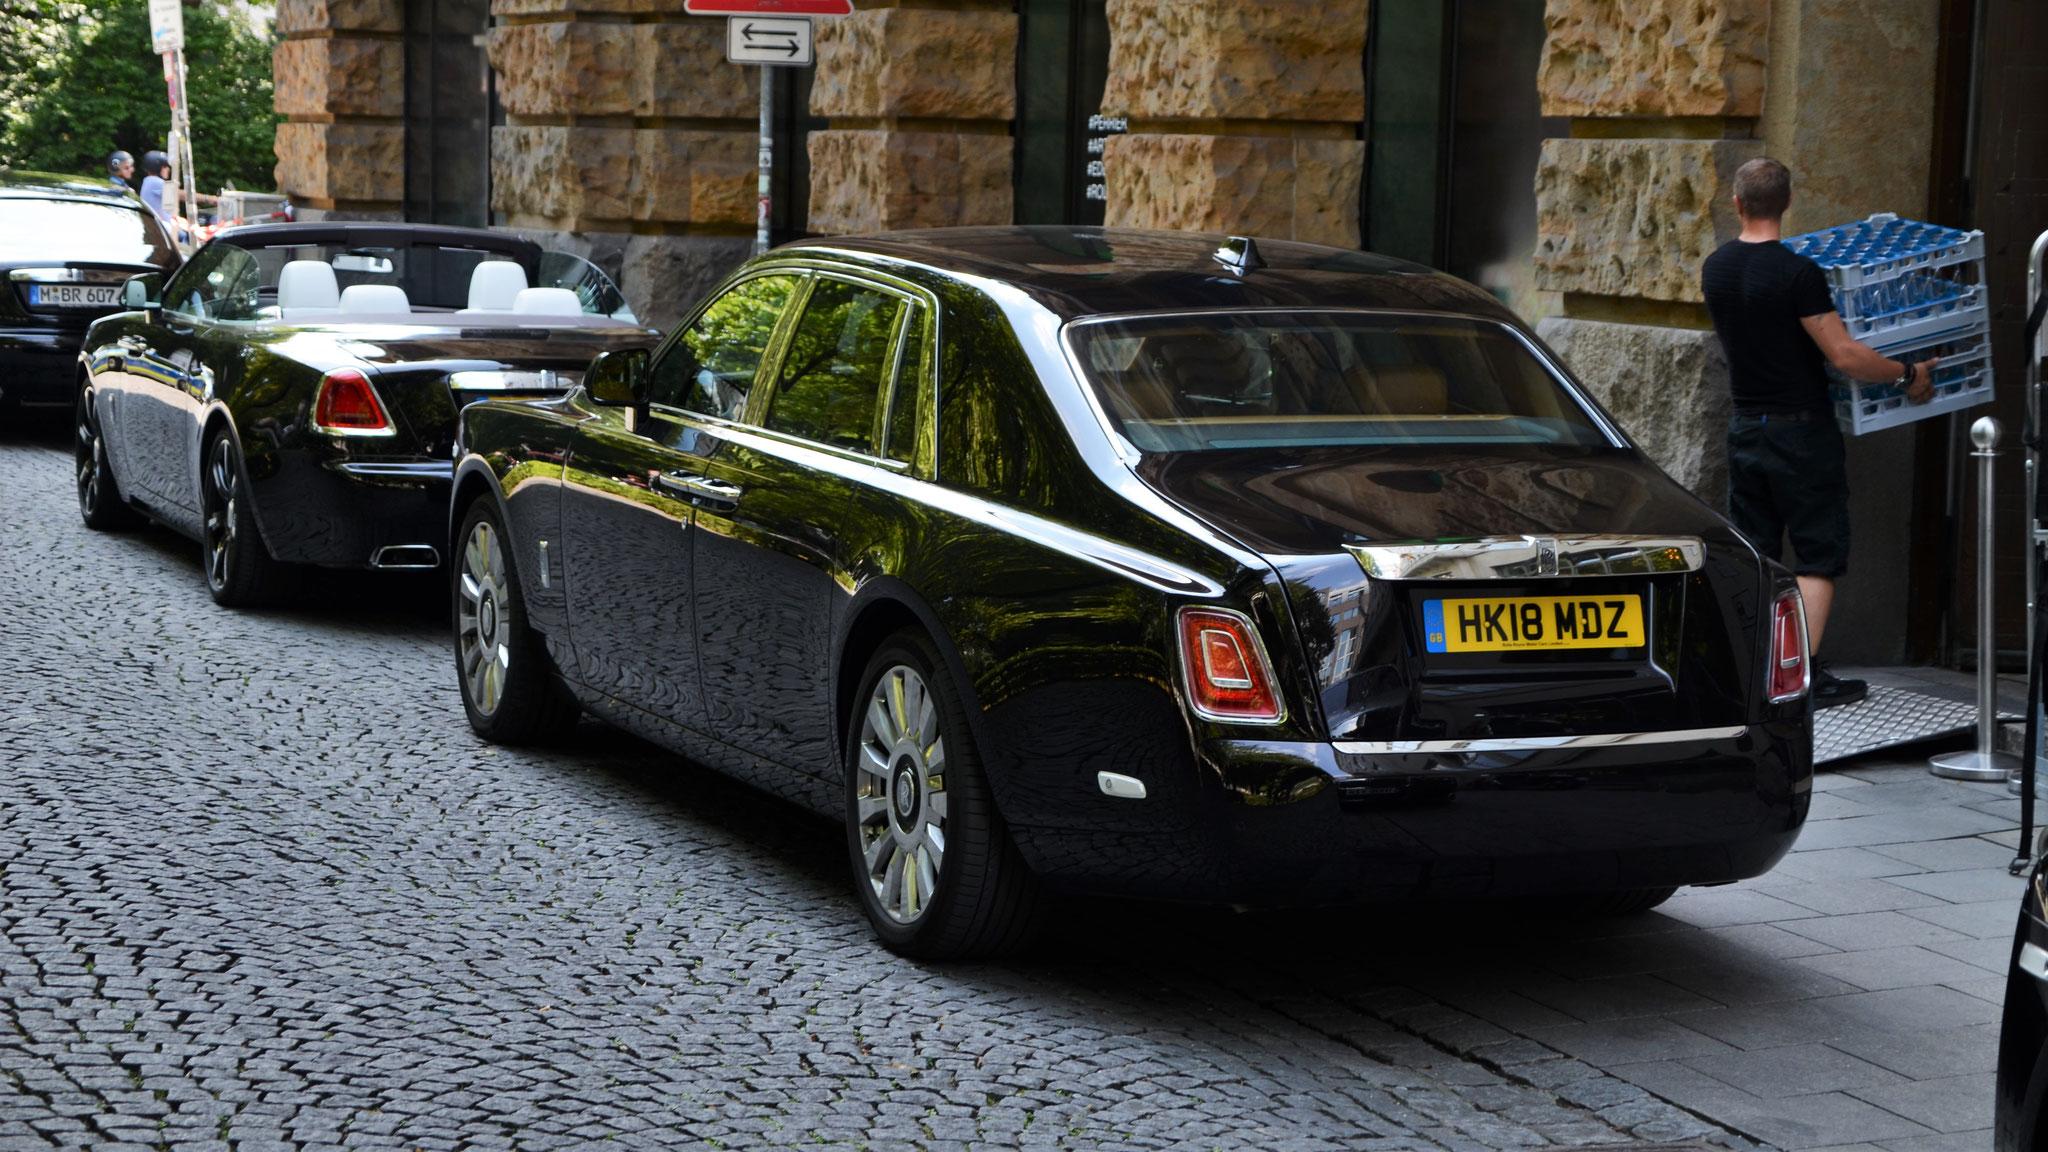 Rolls Royce Phantom - HK18-MDZ (GB)